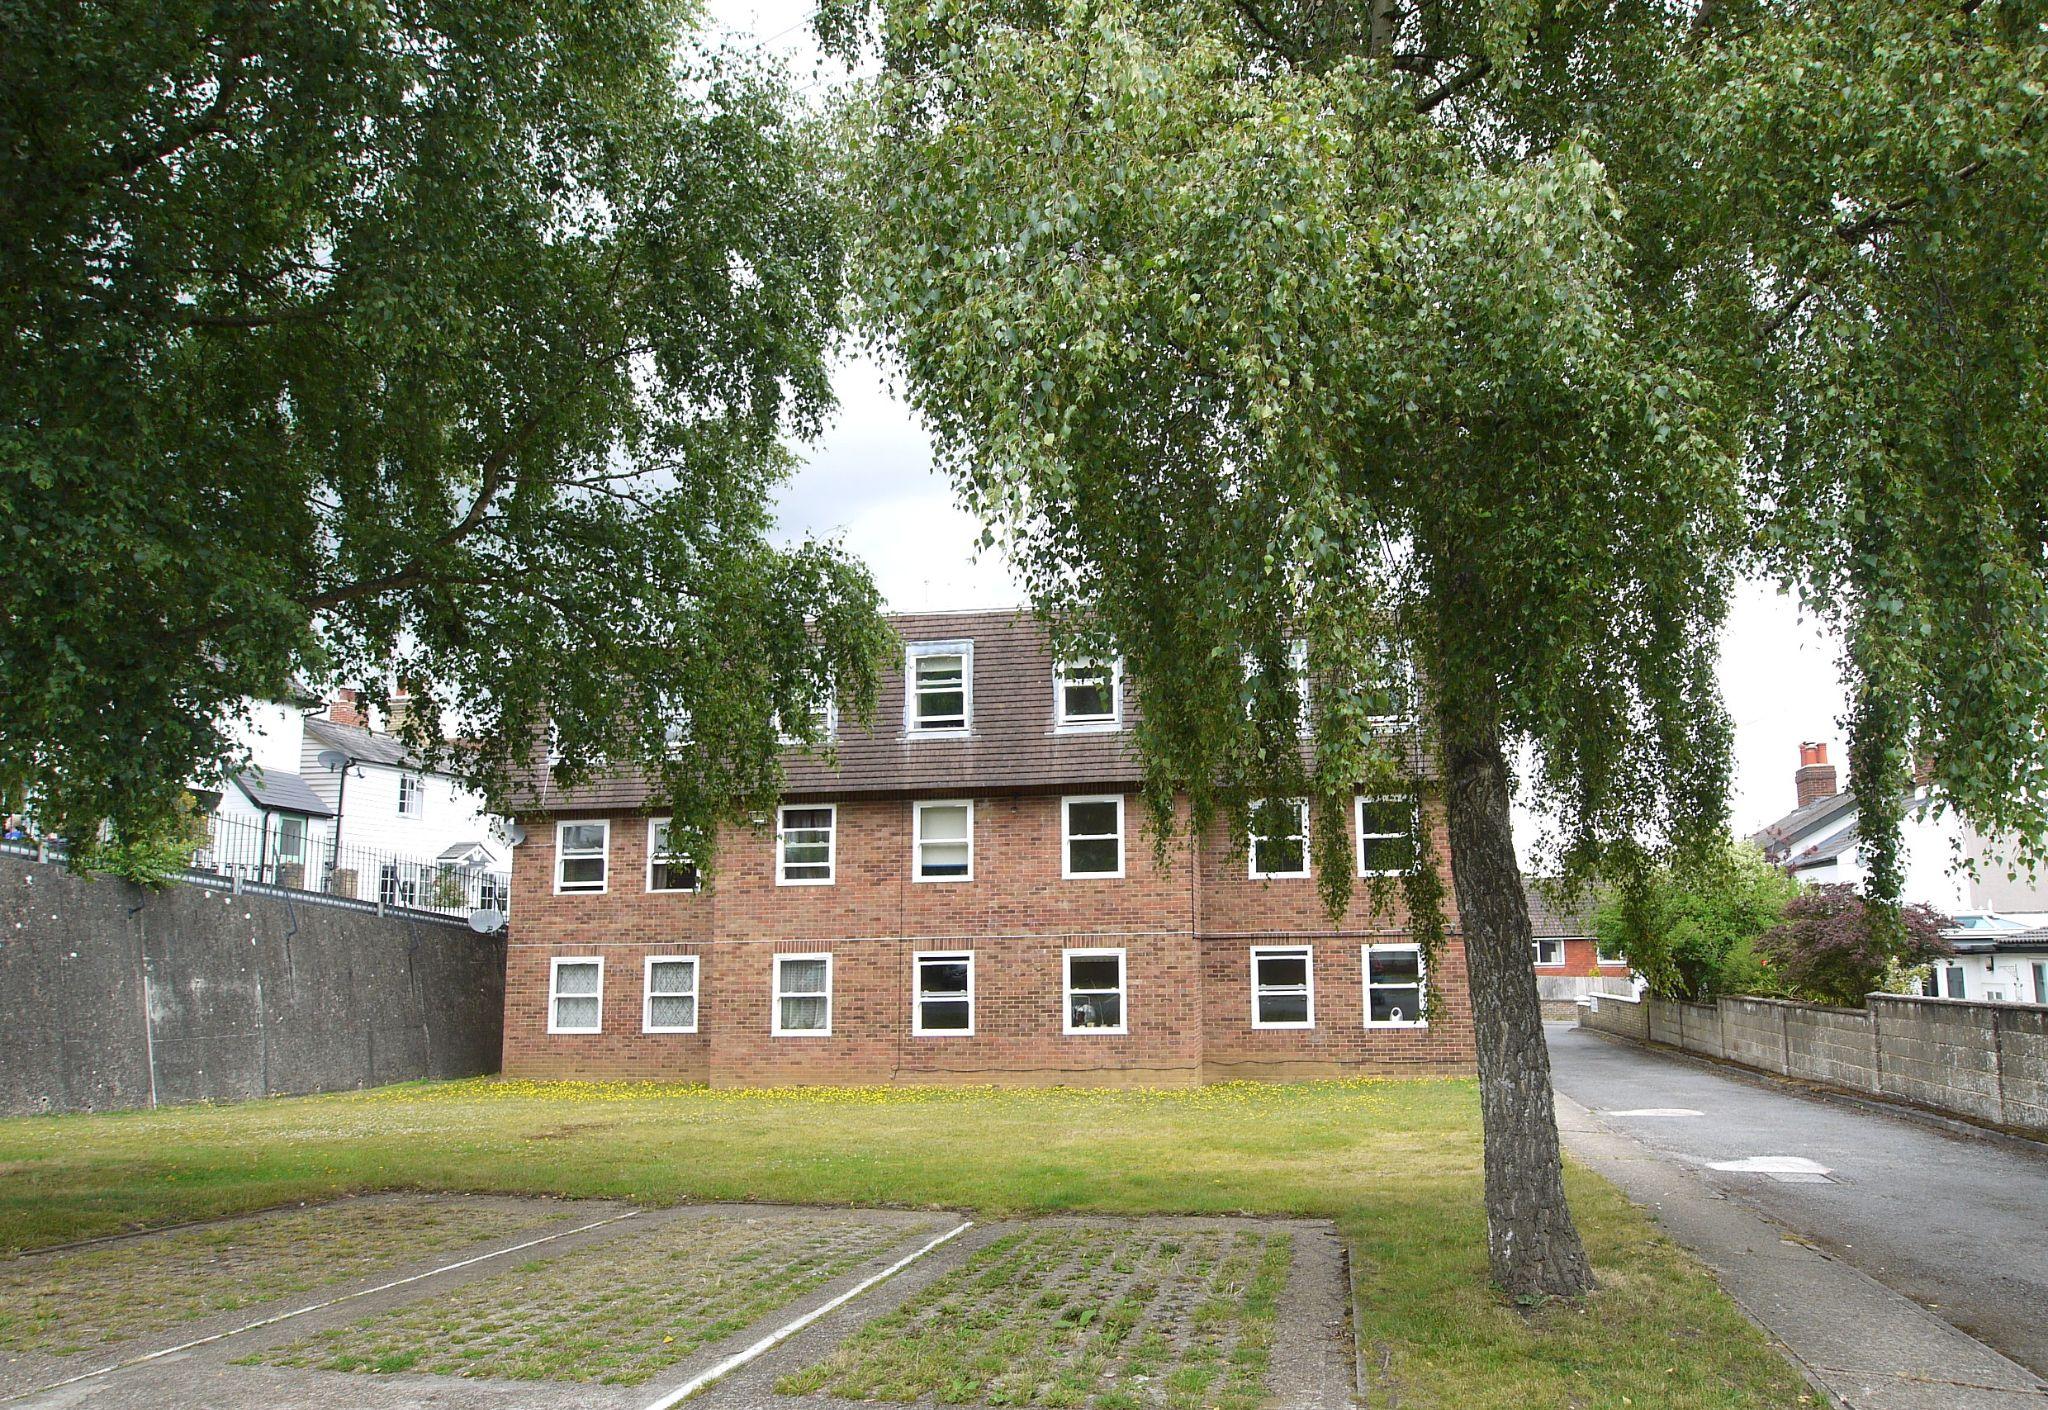 1 bedroom apartment flat/apartment Sold in Sevenoaks - Photograph 7